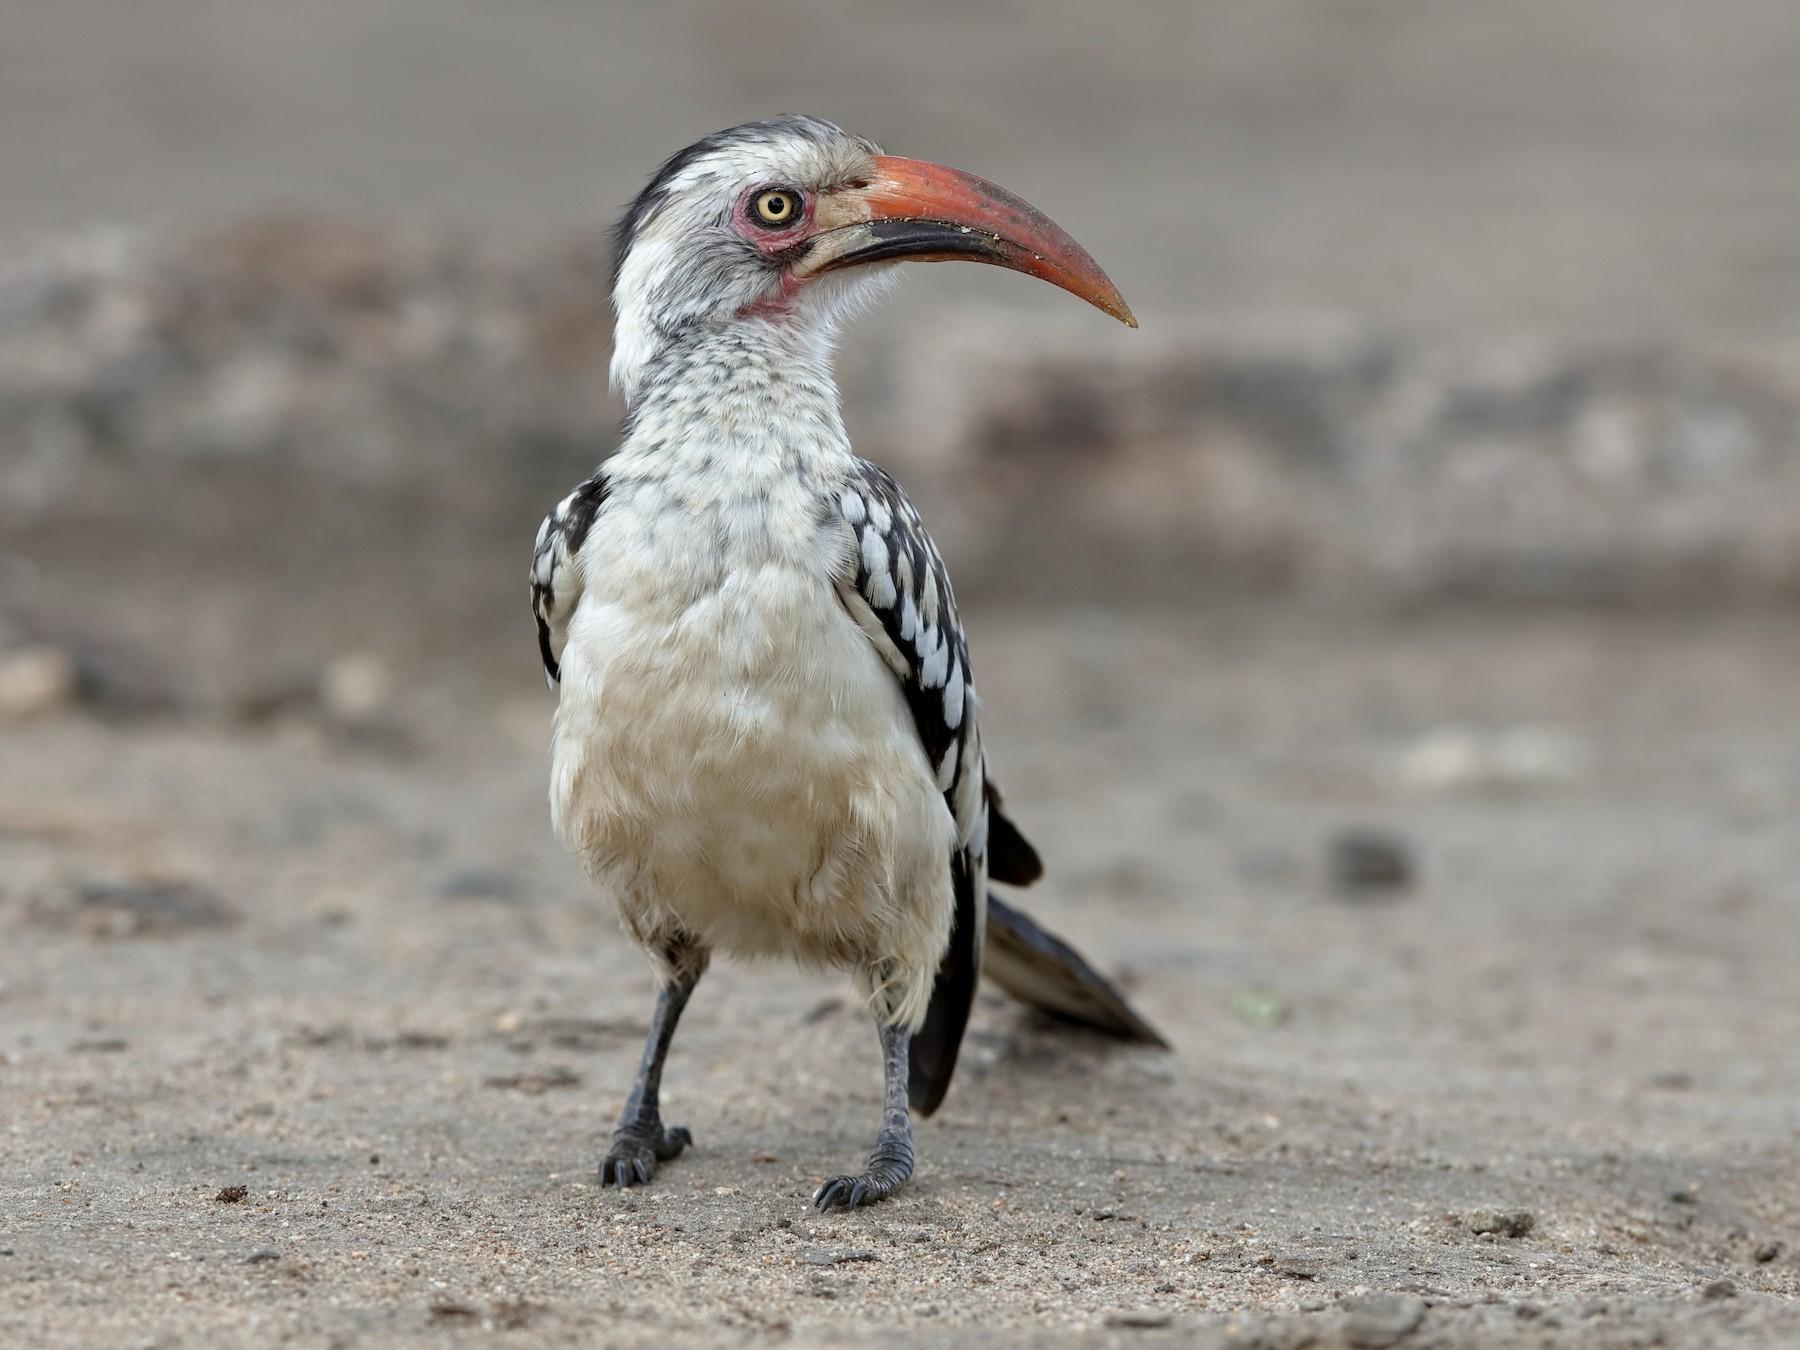 Southern Red-billed Hornbill - Holger Teichmann